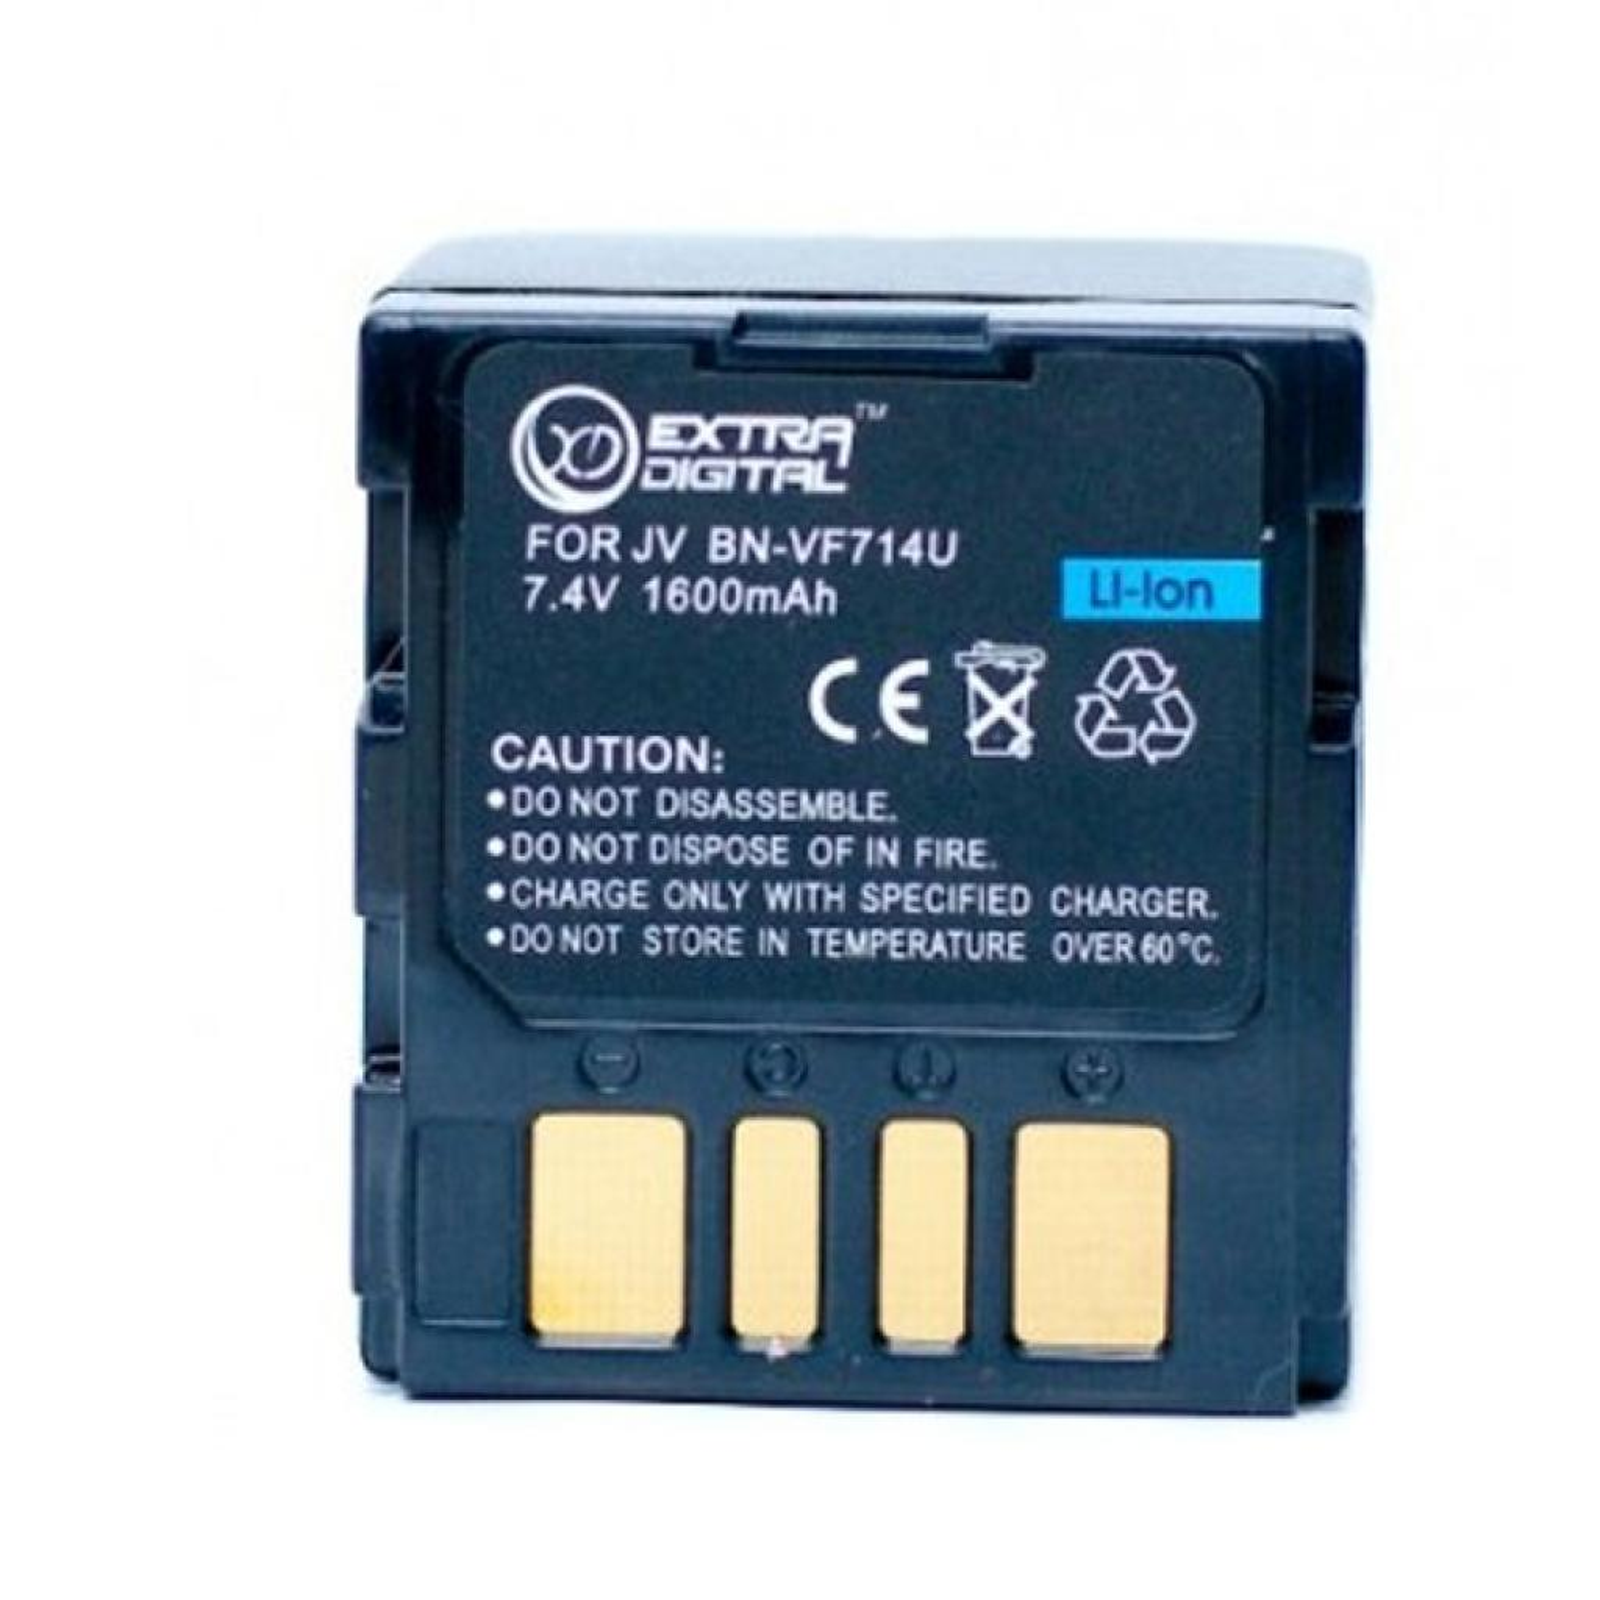 Аккумулятор к фото/видео EXTRADIGITAL JVC BN-VF714U (DV00DV1179)